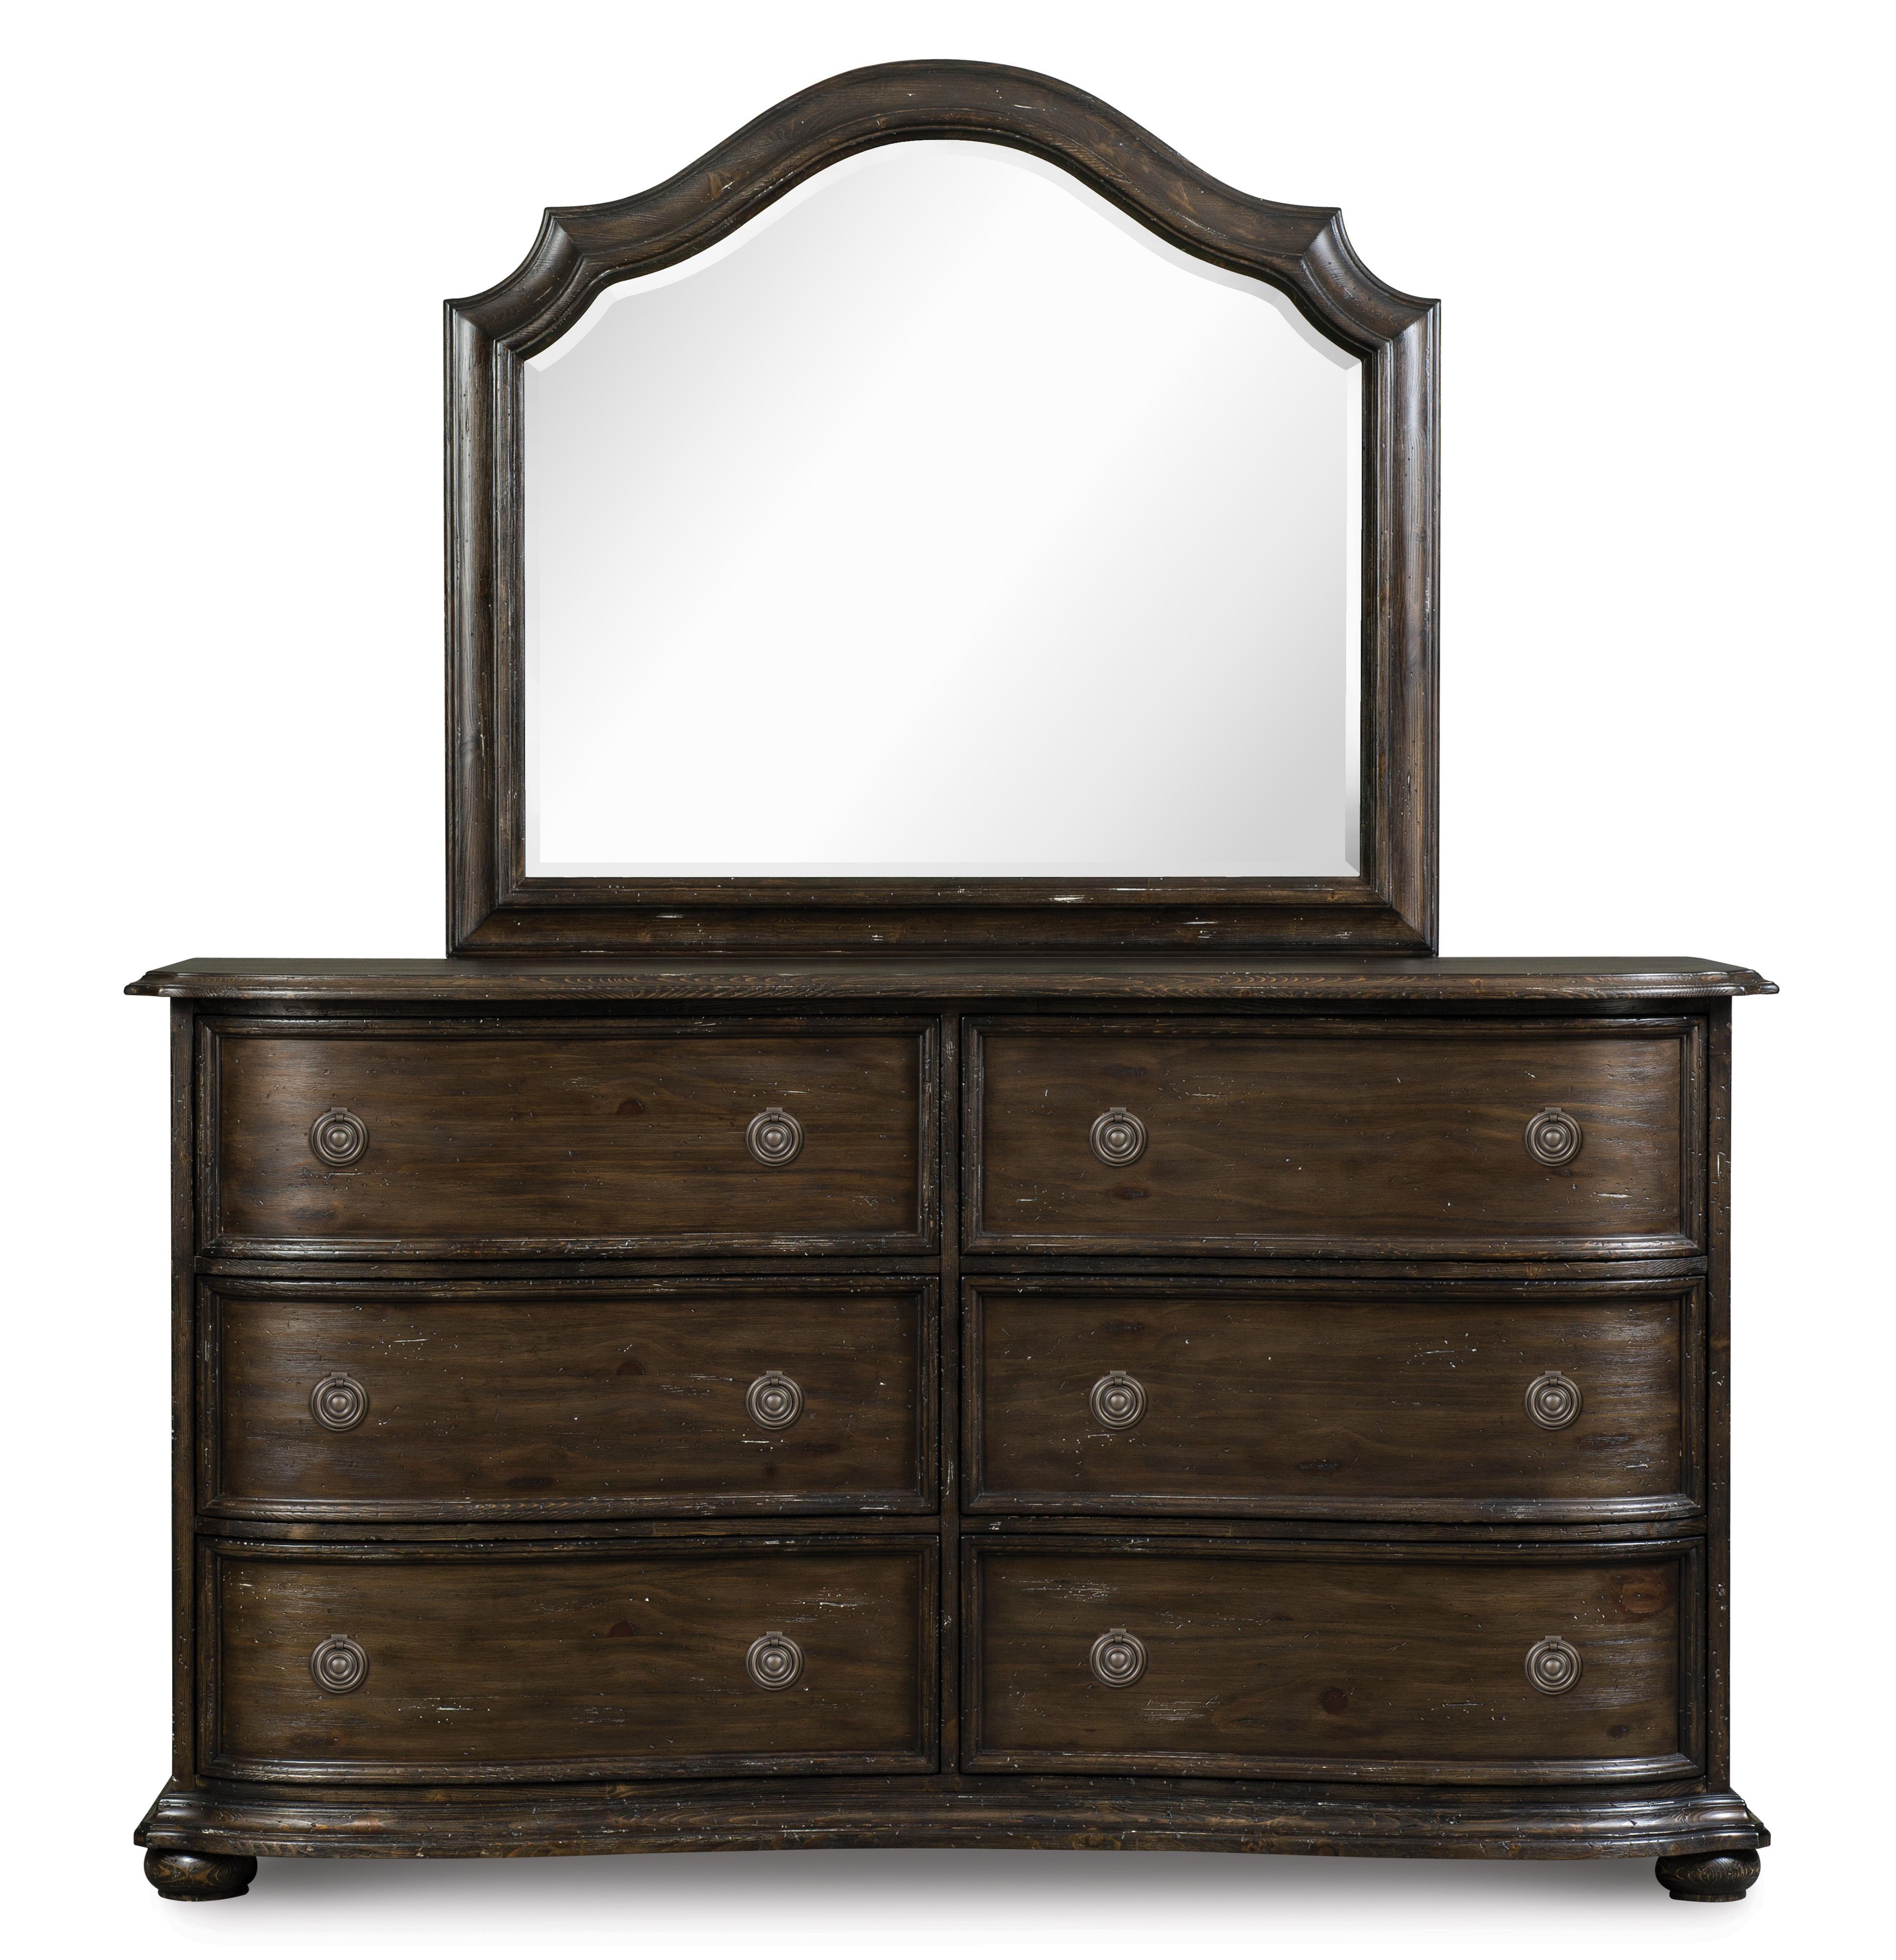 Magnussen Home Muirfield Bedroom Drawer Dresser and Shaped Mirror - Item Number: B2258-20+45